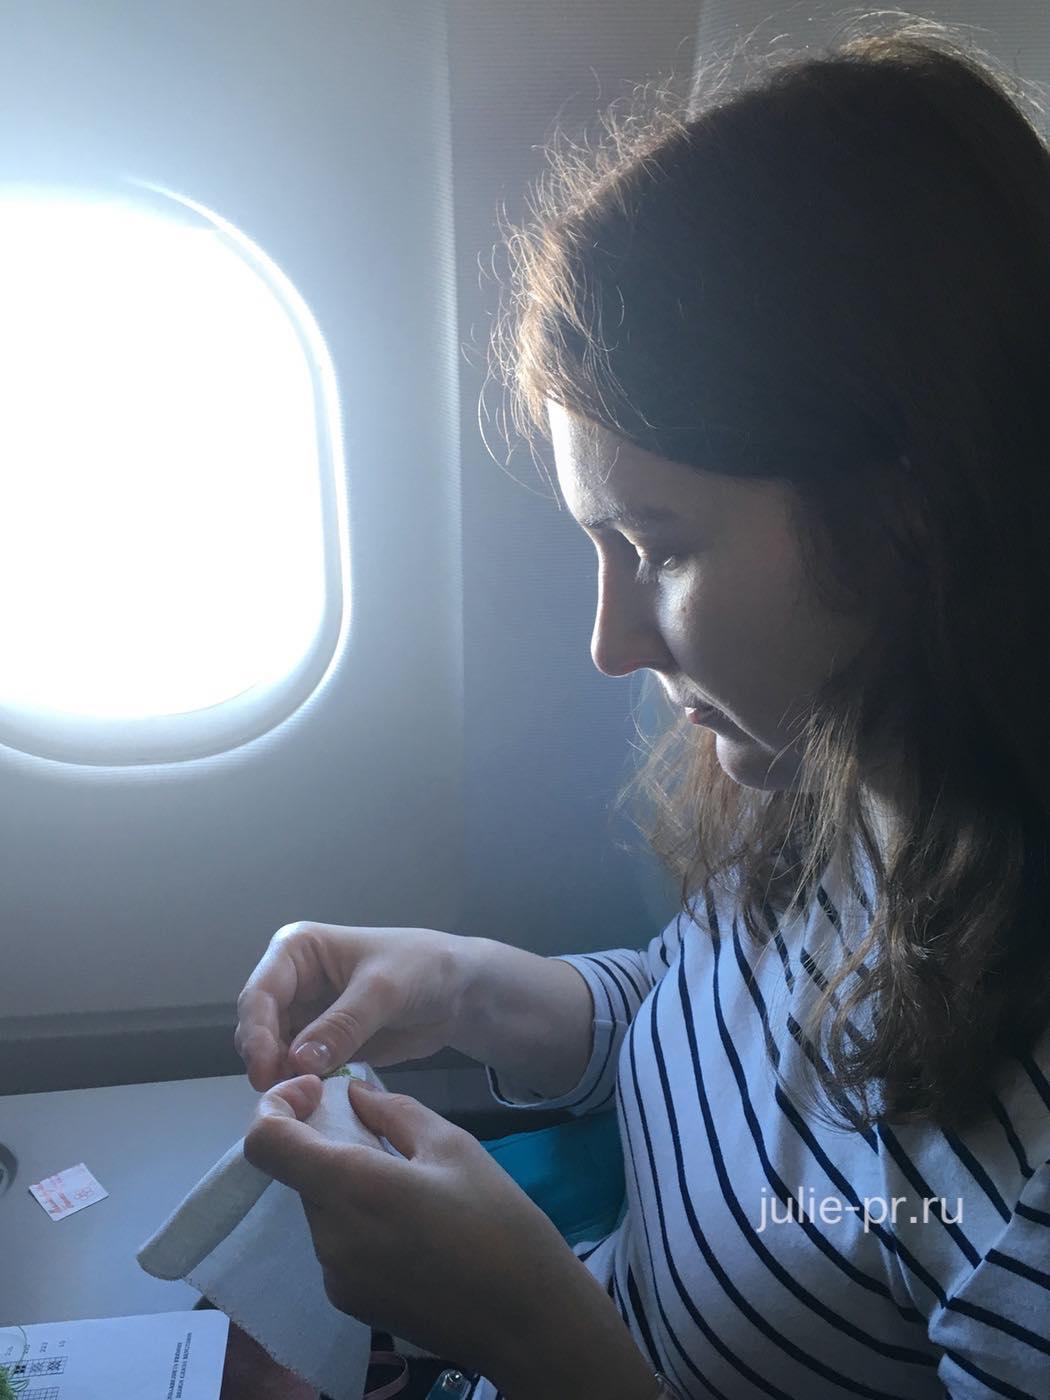 Аргентина, вышивка в самолёте